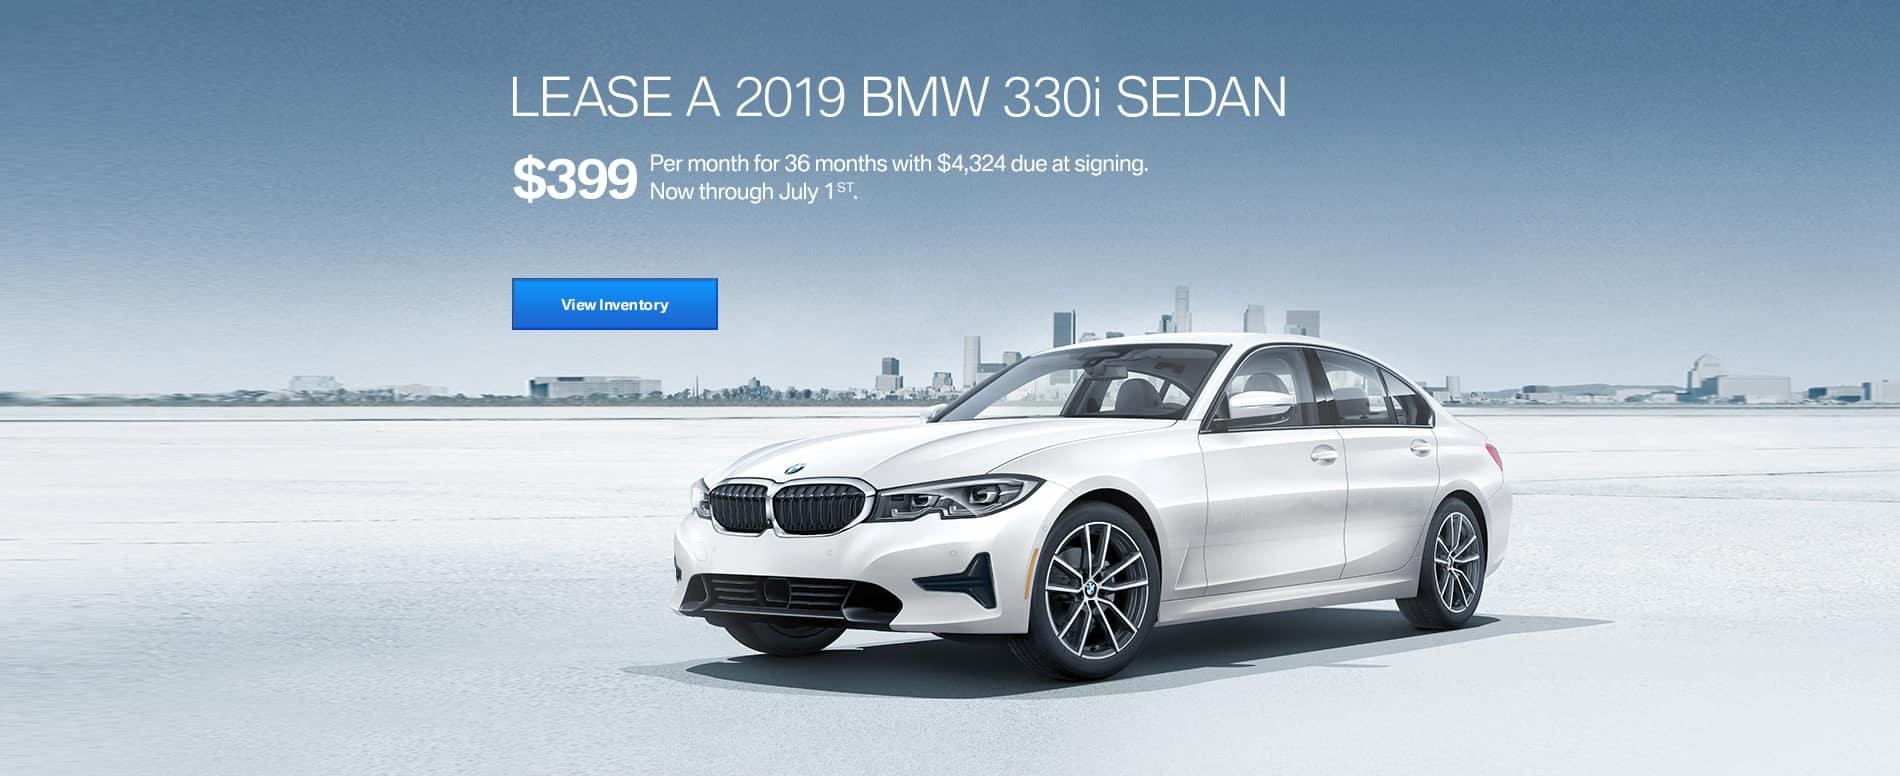 lease_a_2019_bmw_330i_$399_per_month